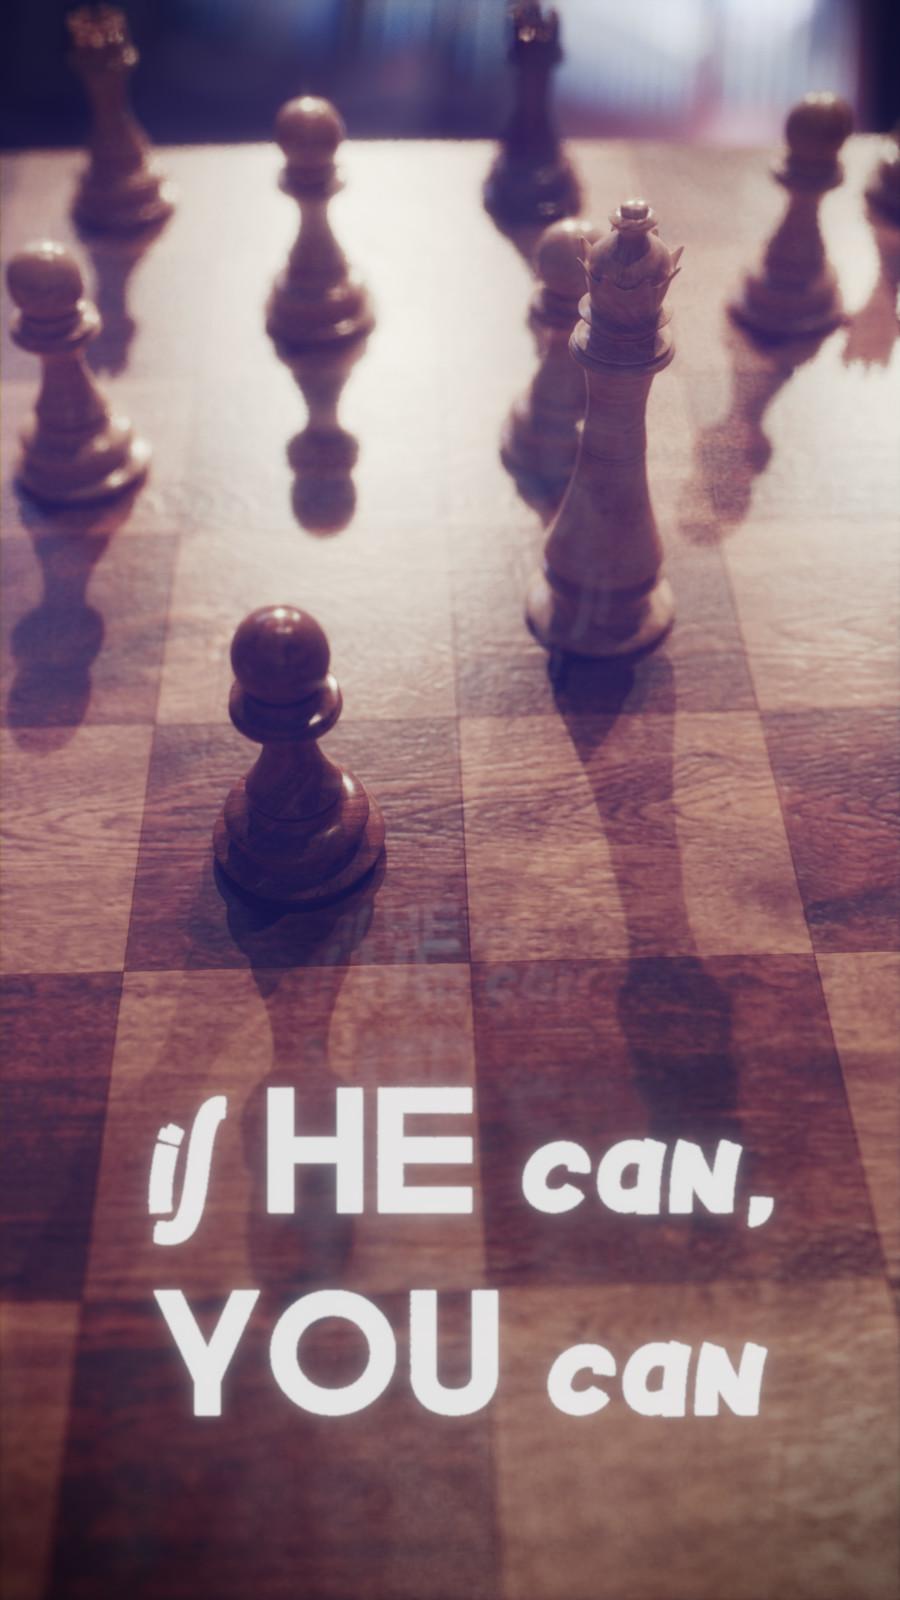 Motivational Chess